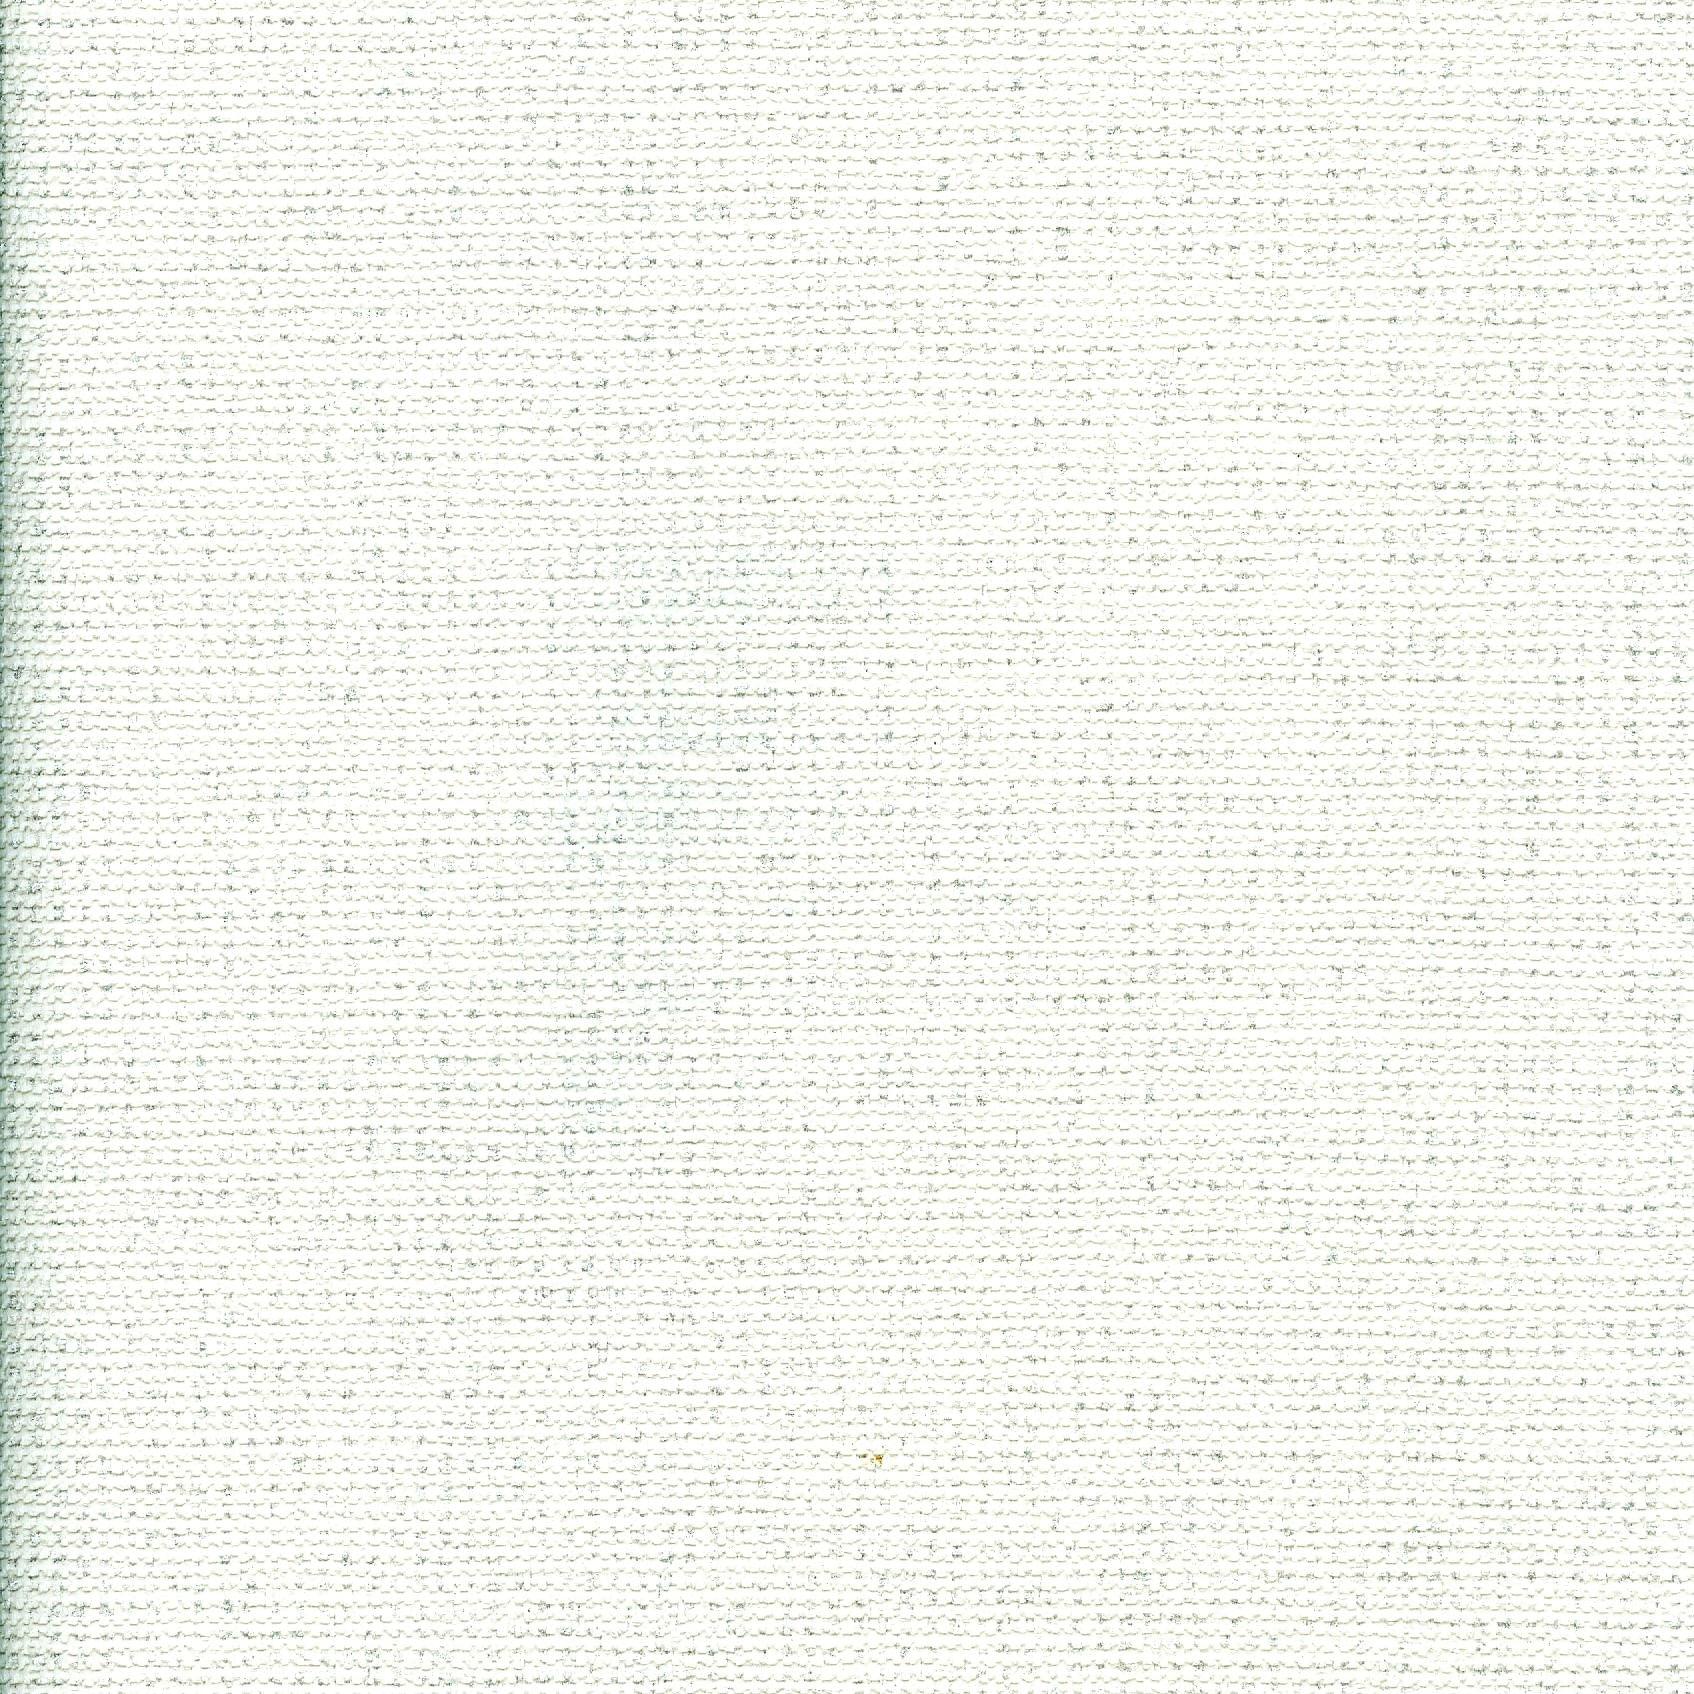 Papel de Parede Pure 2 Tramado 187503 - Rolo: 10m x 0,53m